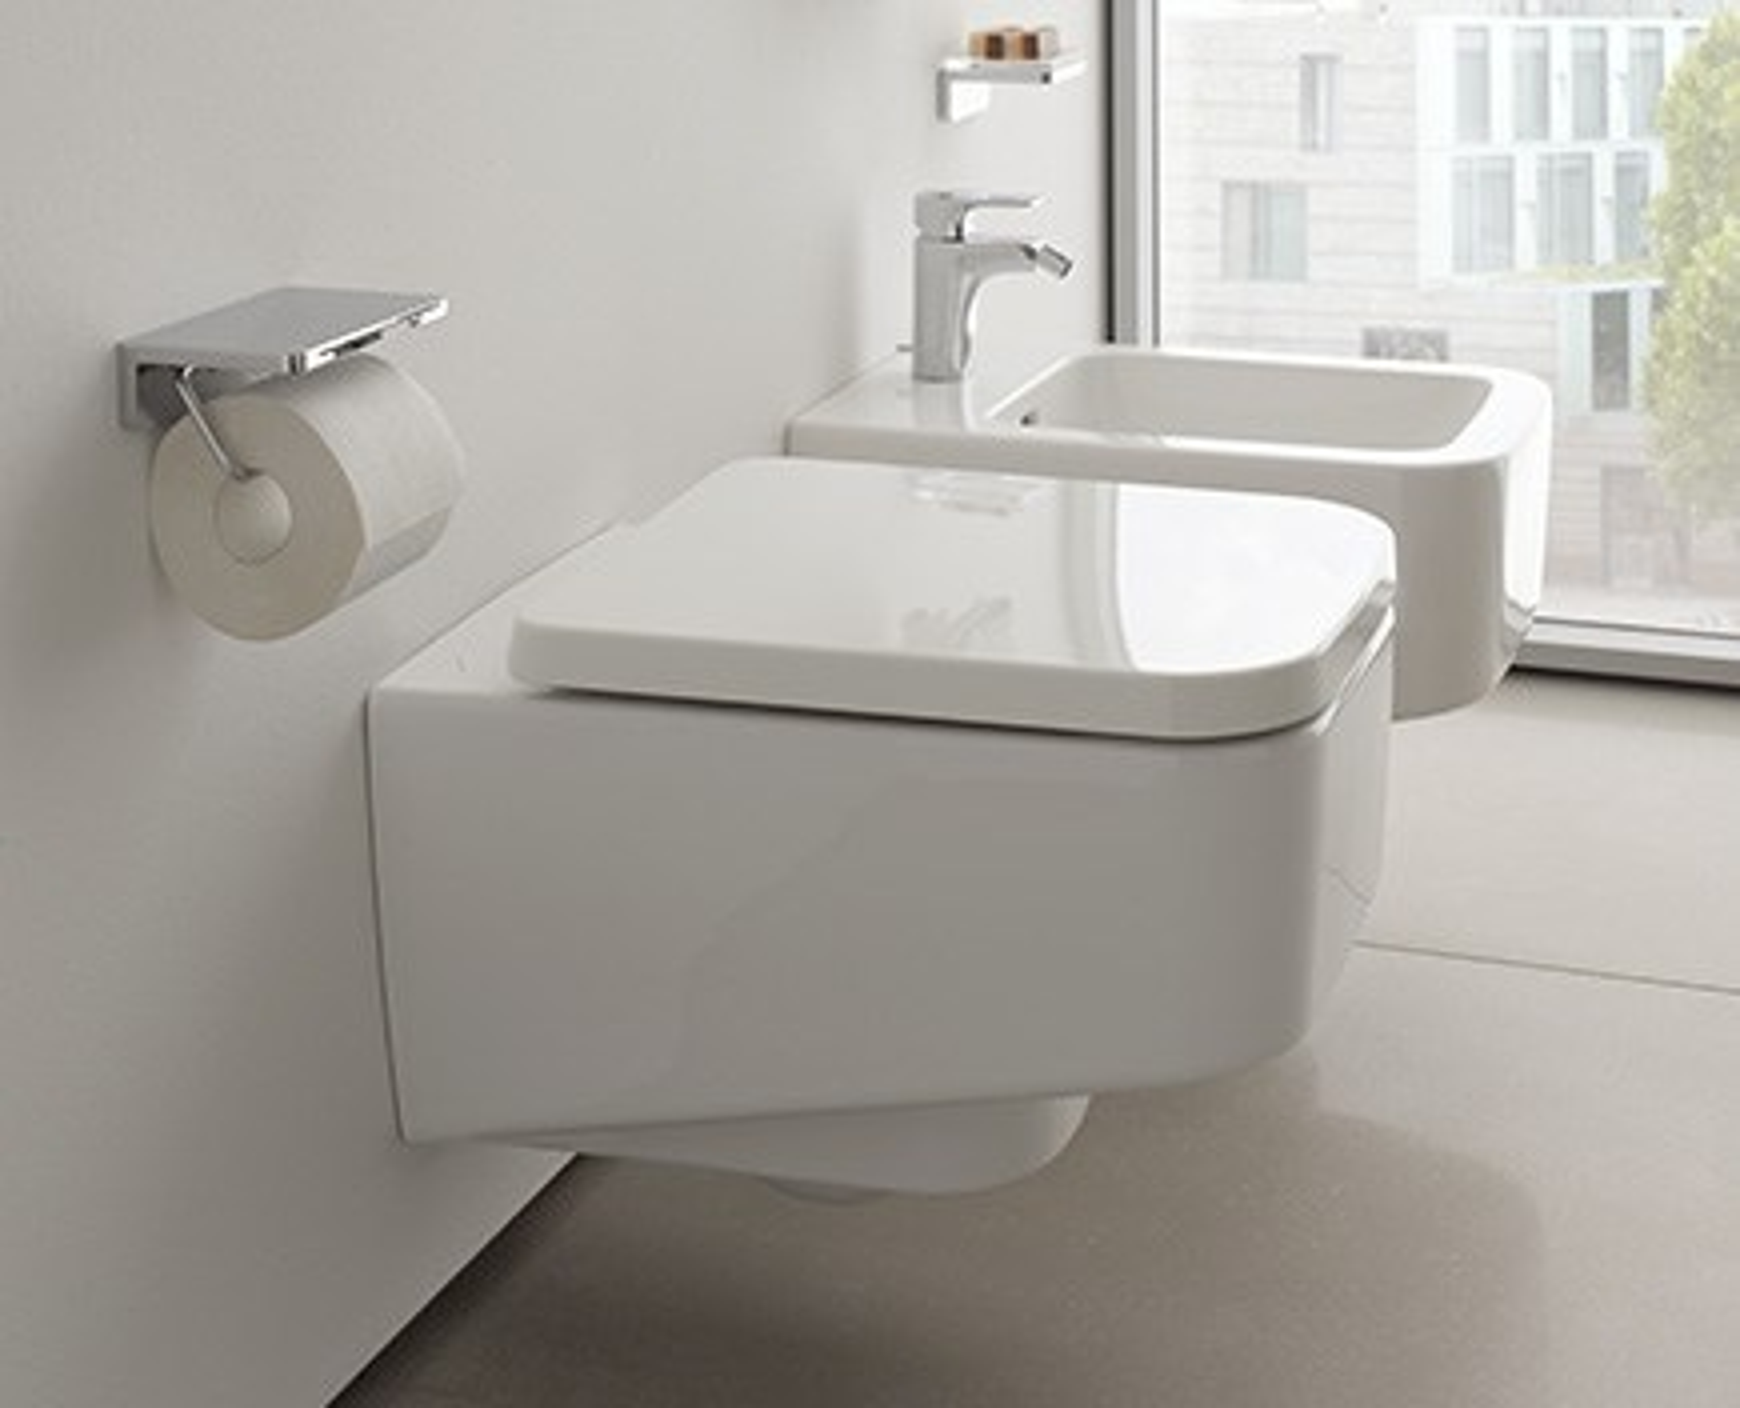 wc sitz pro s perfecto design. Black Bedroom Furniture Sets. Home Design Ideas